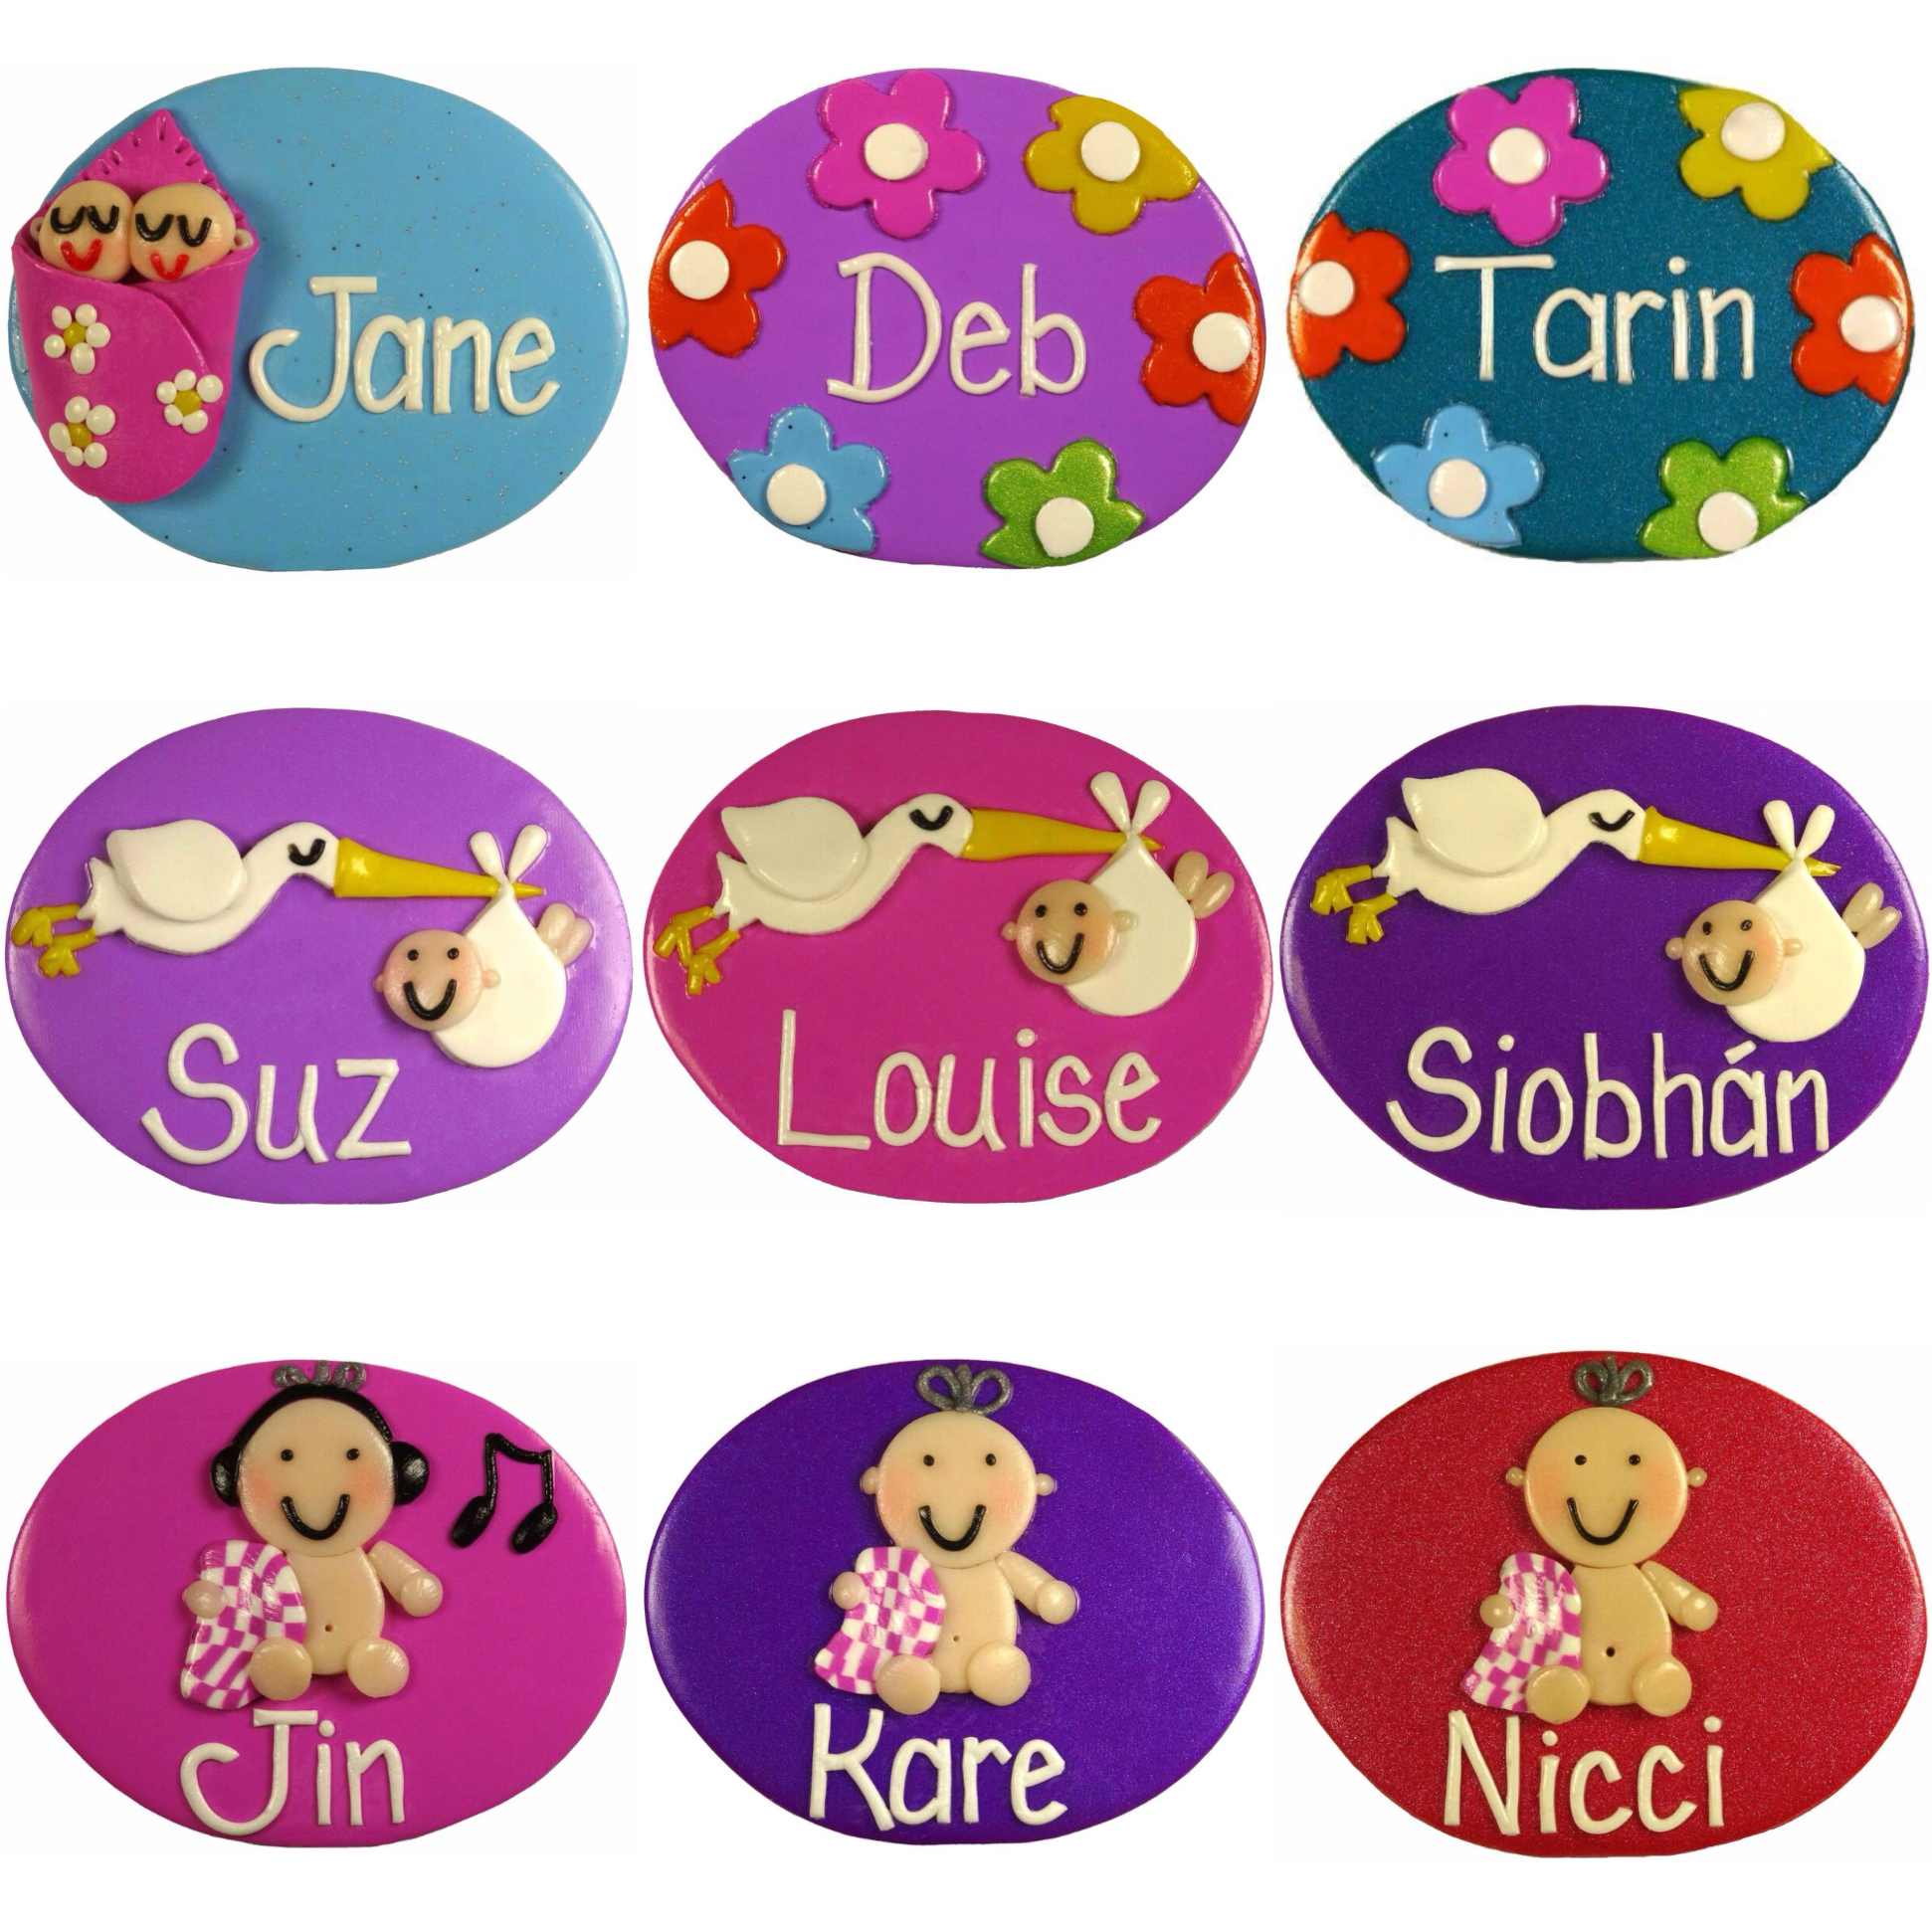 Nurse Name Badges Twins in Blanket, Flowers A, Stork & Baby.